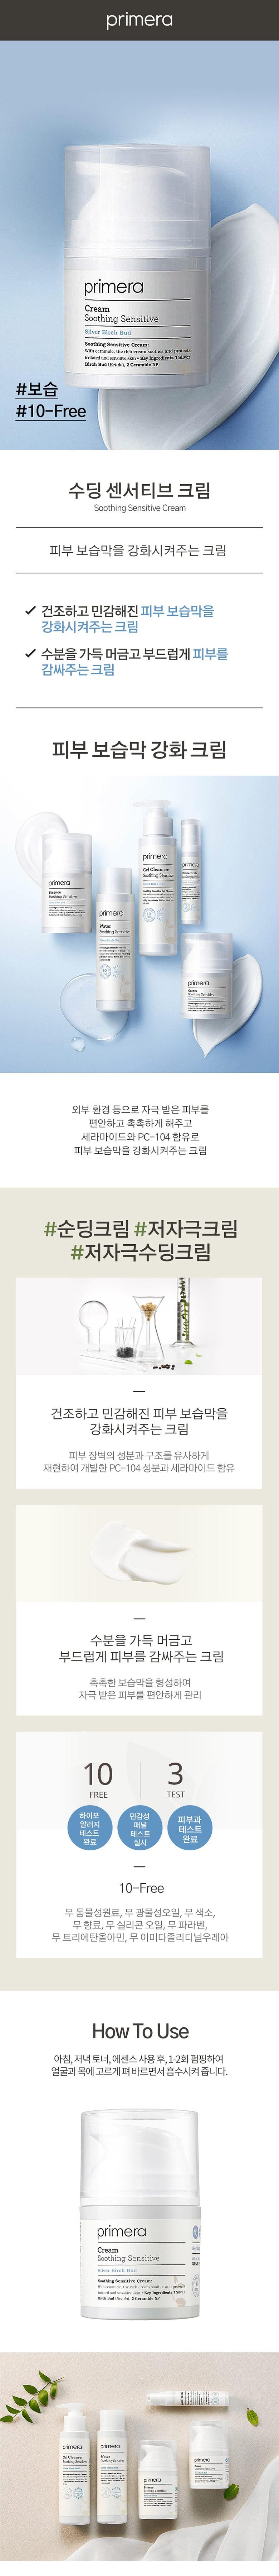 primera Soothing Sensitive Cream korean skincare product online shop malaysia macau poland1